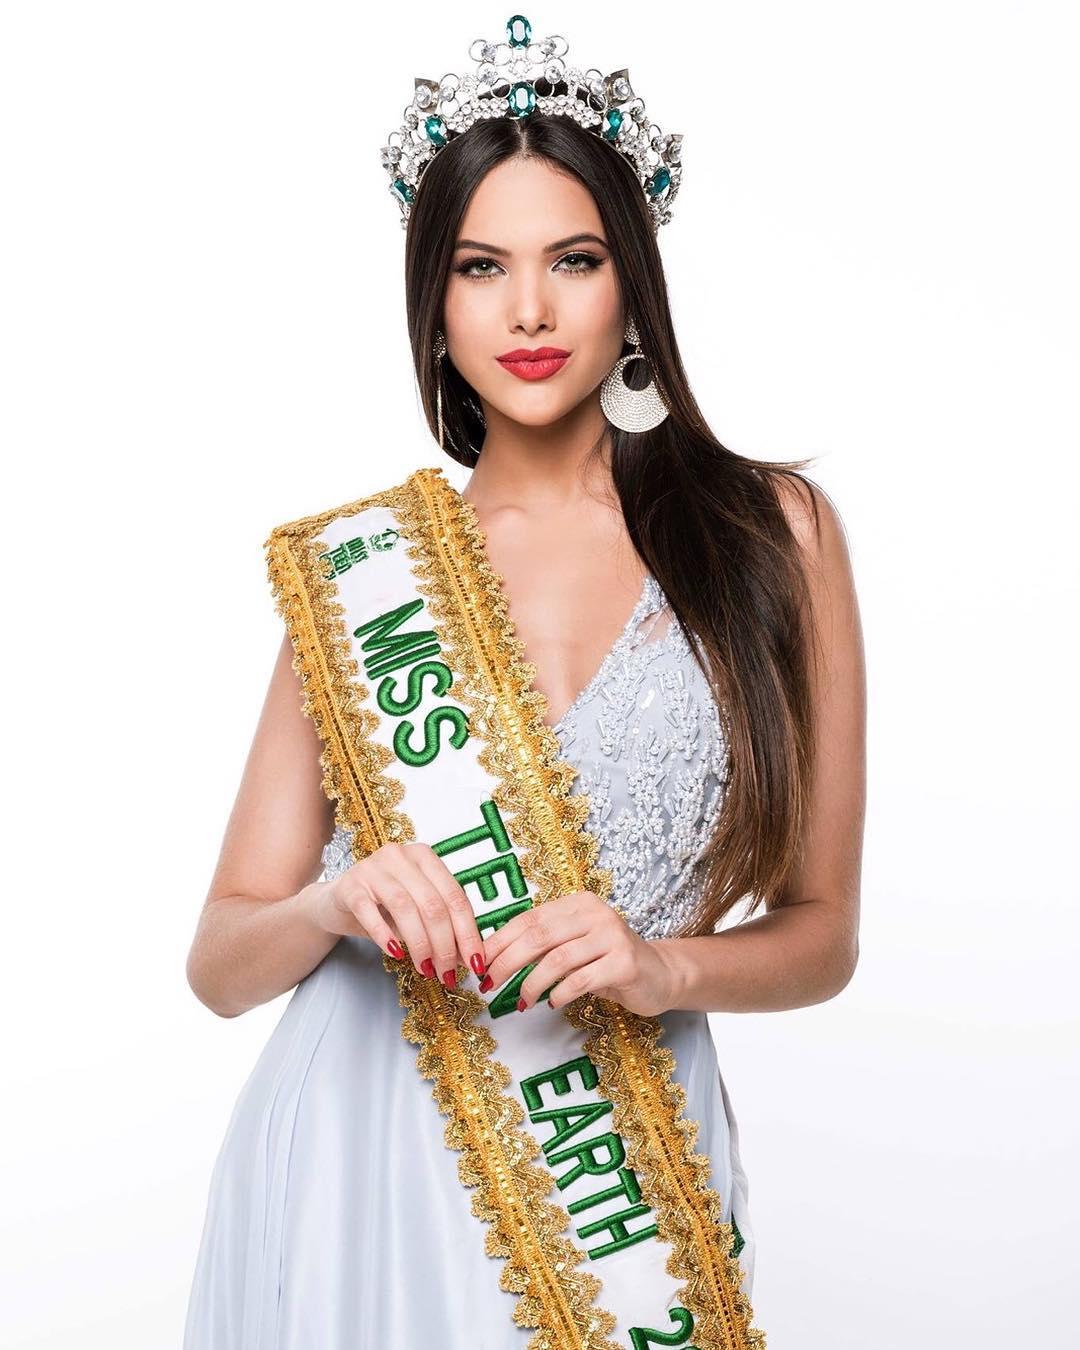 emily garcia, miss teen earth international 2017. - Página 6 Mqd665pv